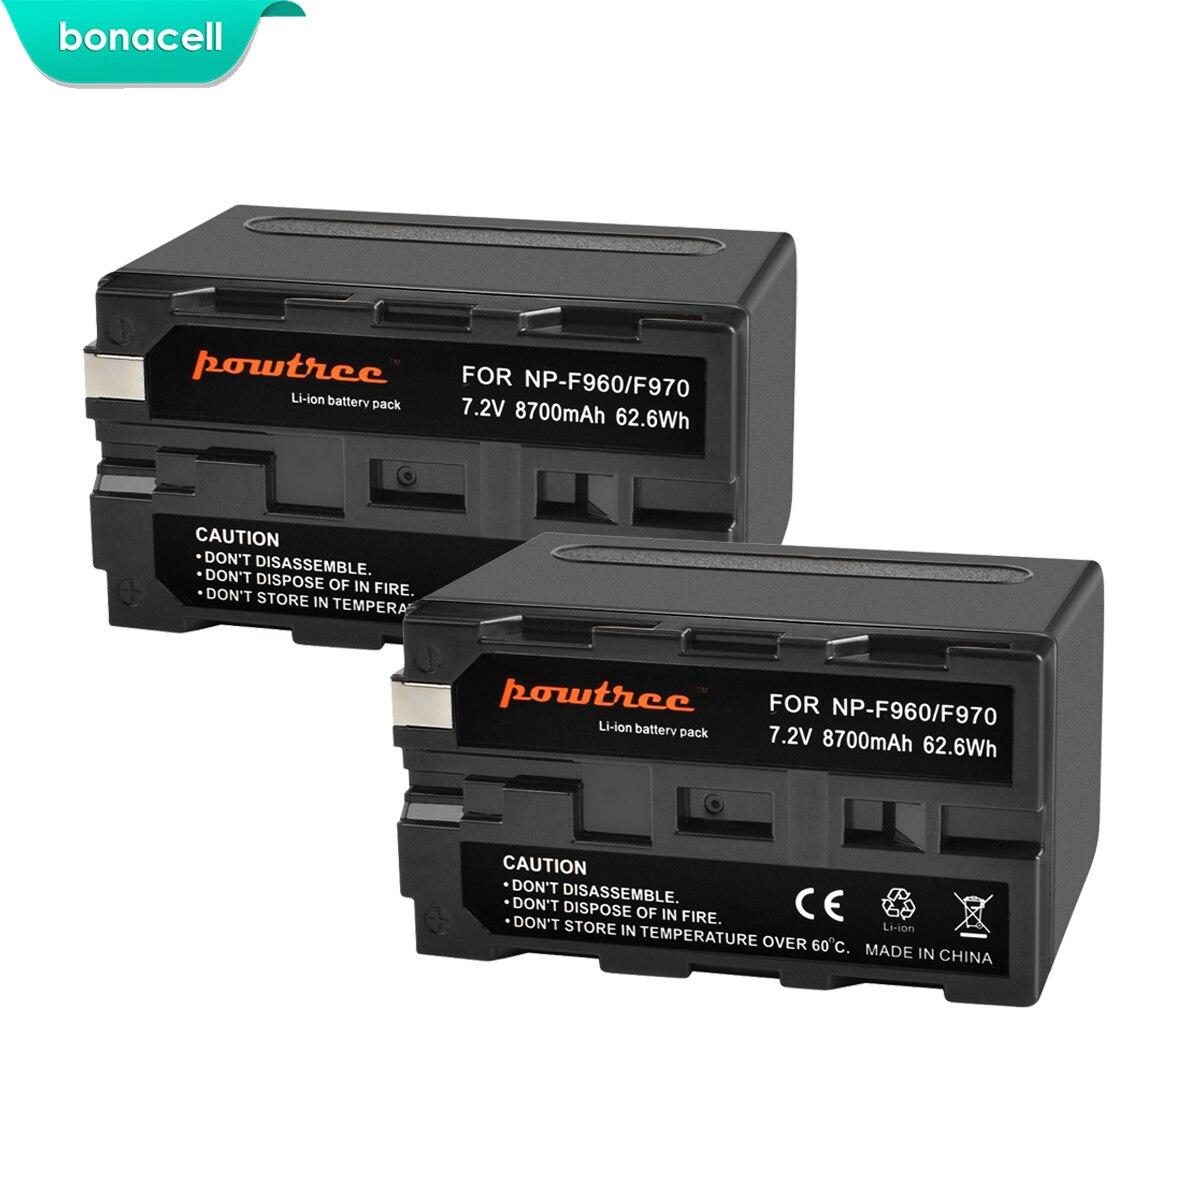 7.2 v 8700 mah NP-F960 Bonacell NP-F970 F960 F970 F950 Bateria Para Sony NP PLM-100 CCD-TRV35 MVC-FD91 MC1500C L10